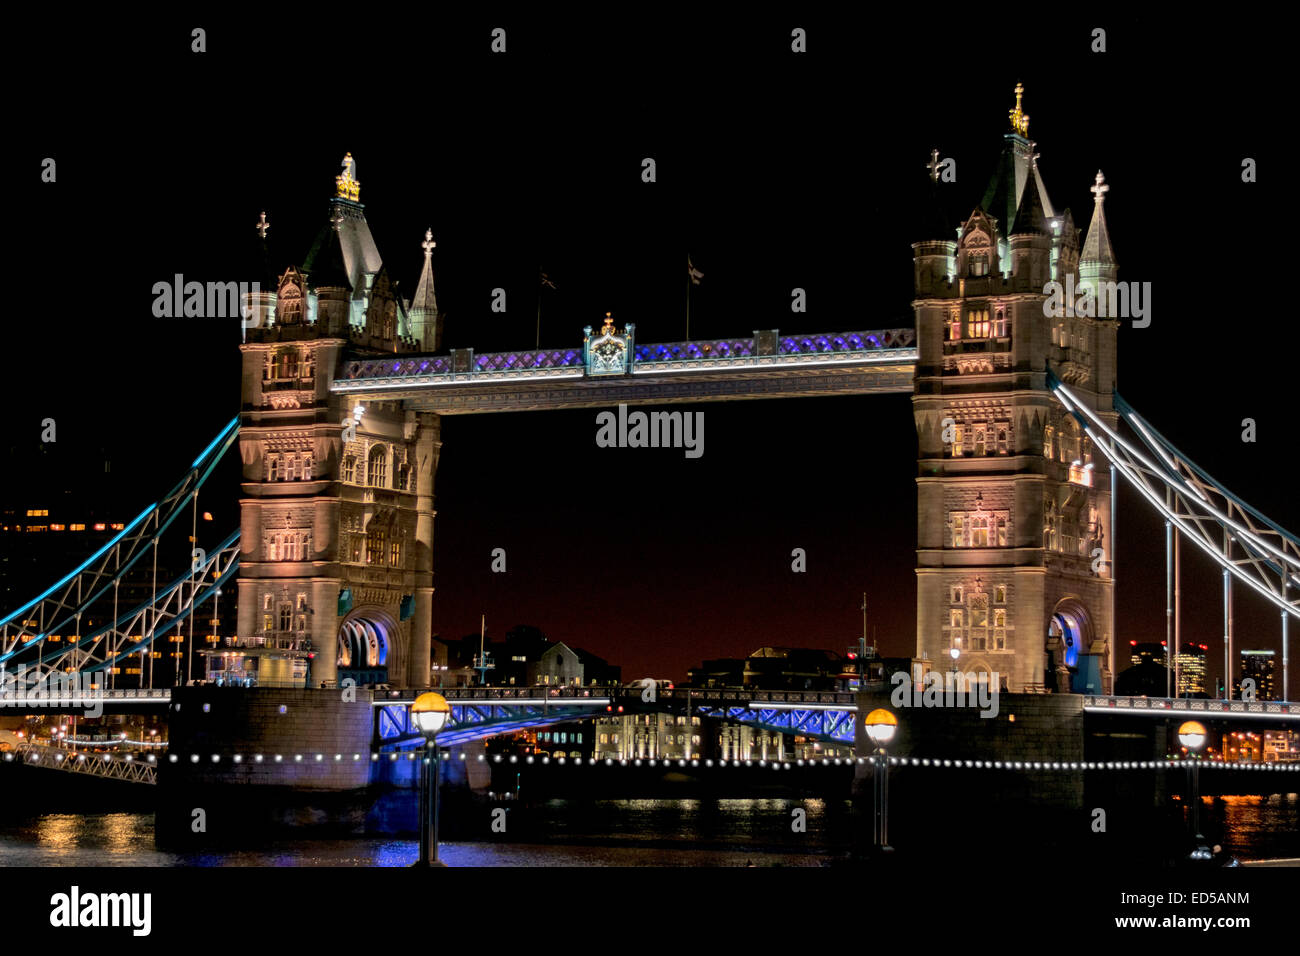 Tower Bridge Christmas Lights 2021 London Tower Bridge With Lights On A Winters Evening At Christmas Stock Photo Alamy